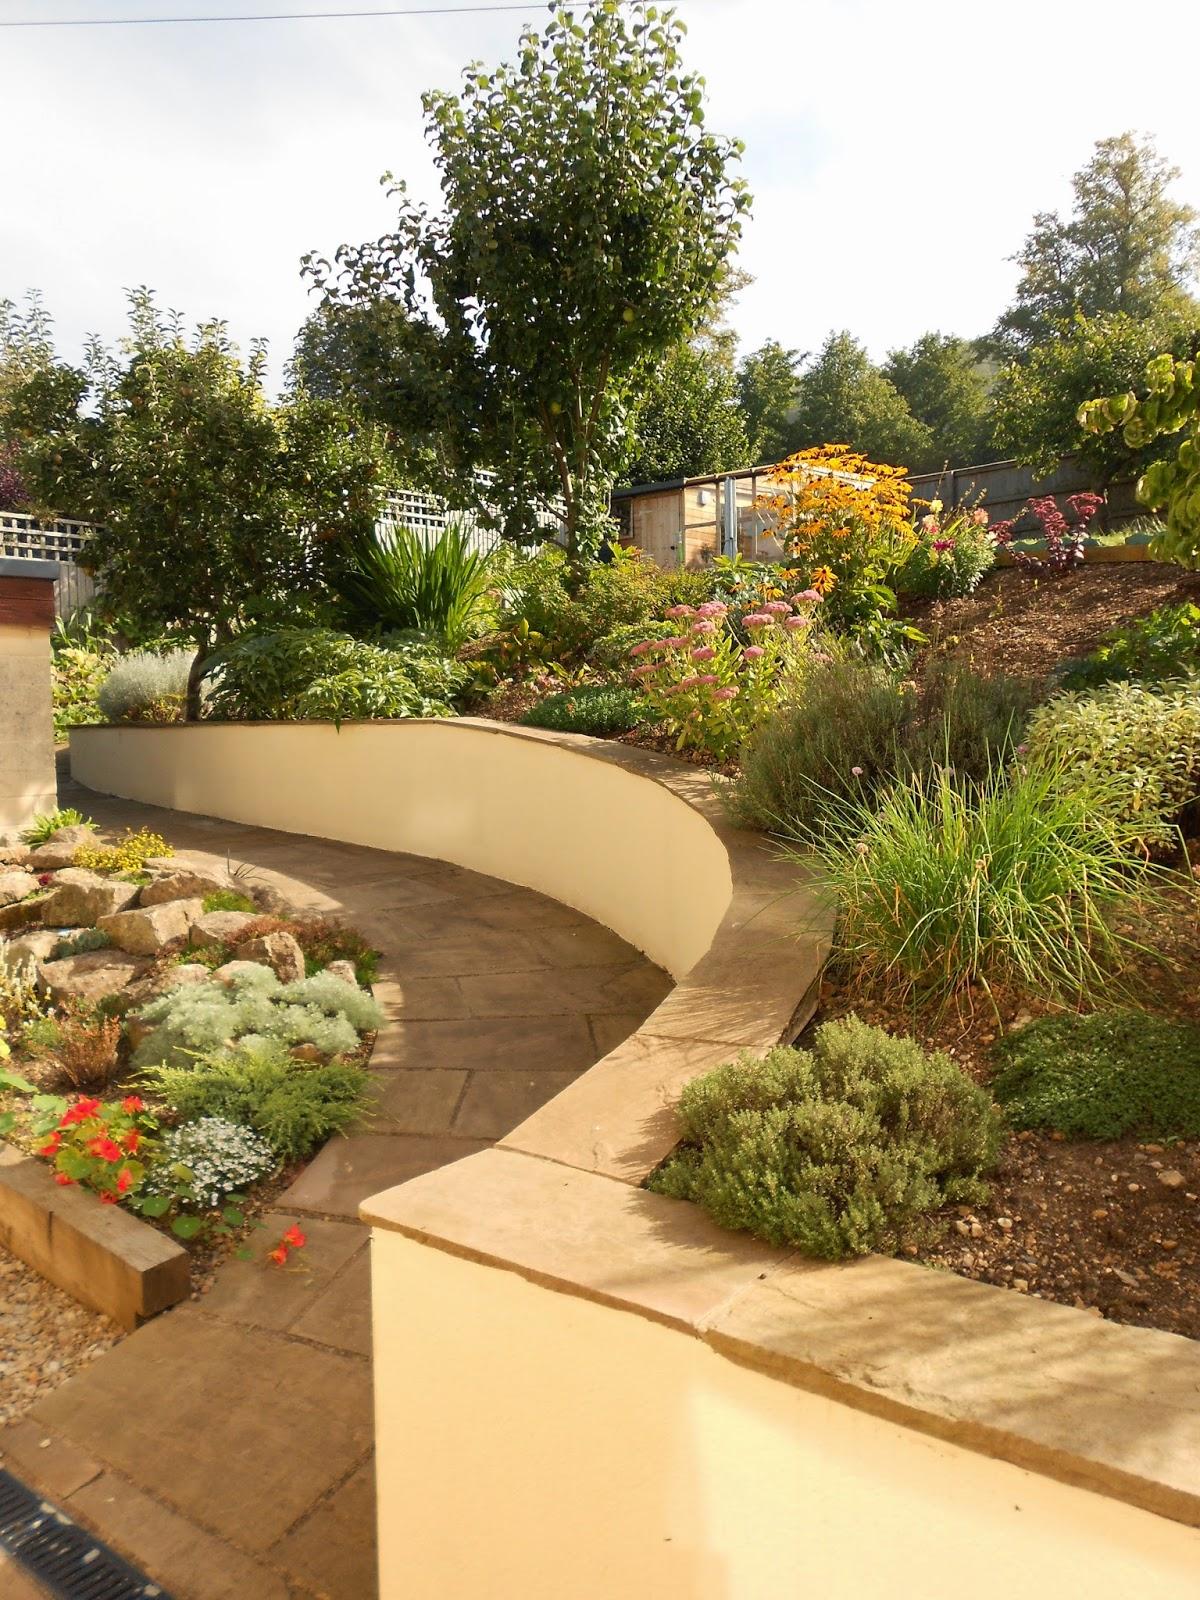 Eliza Gray Gardens - what\'s new in the garden?: Family Garden in Bath